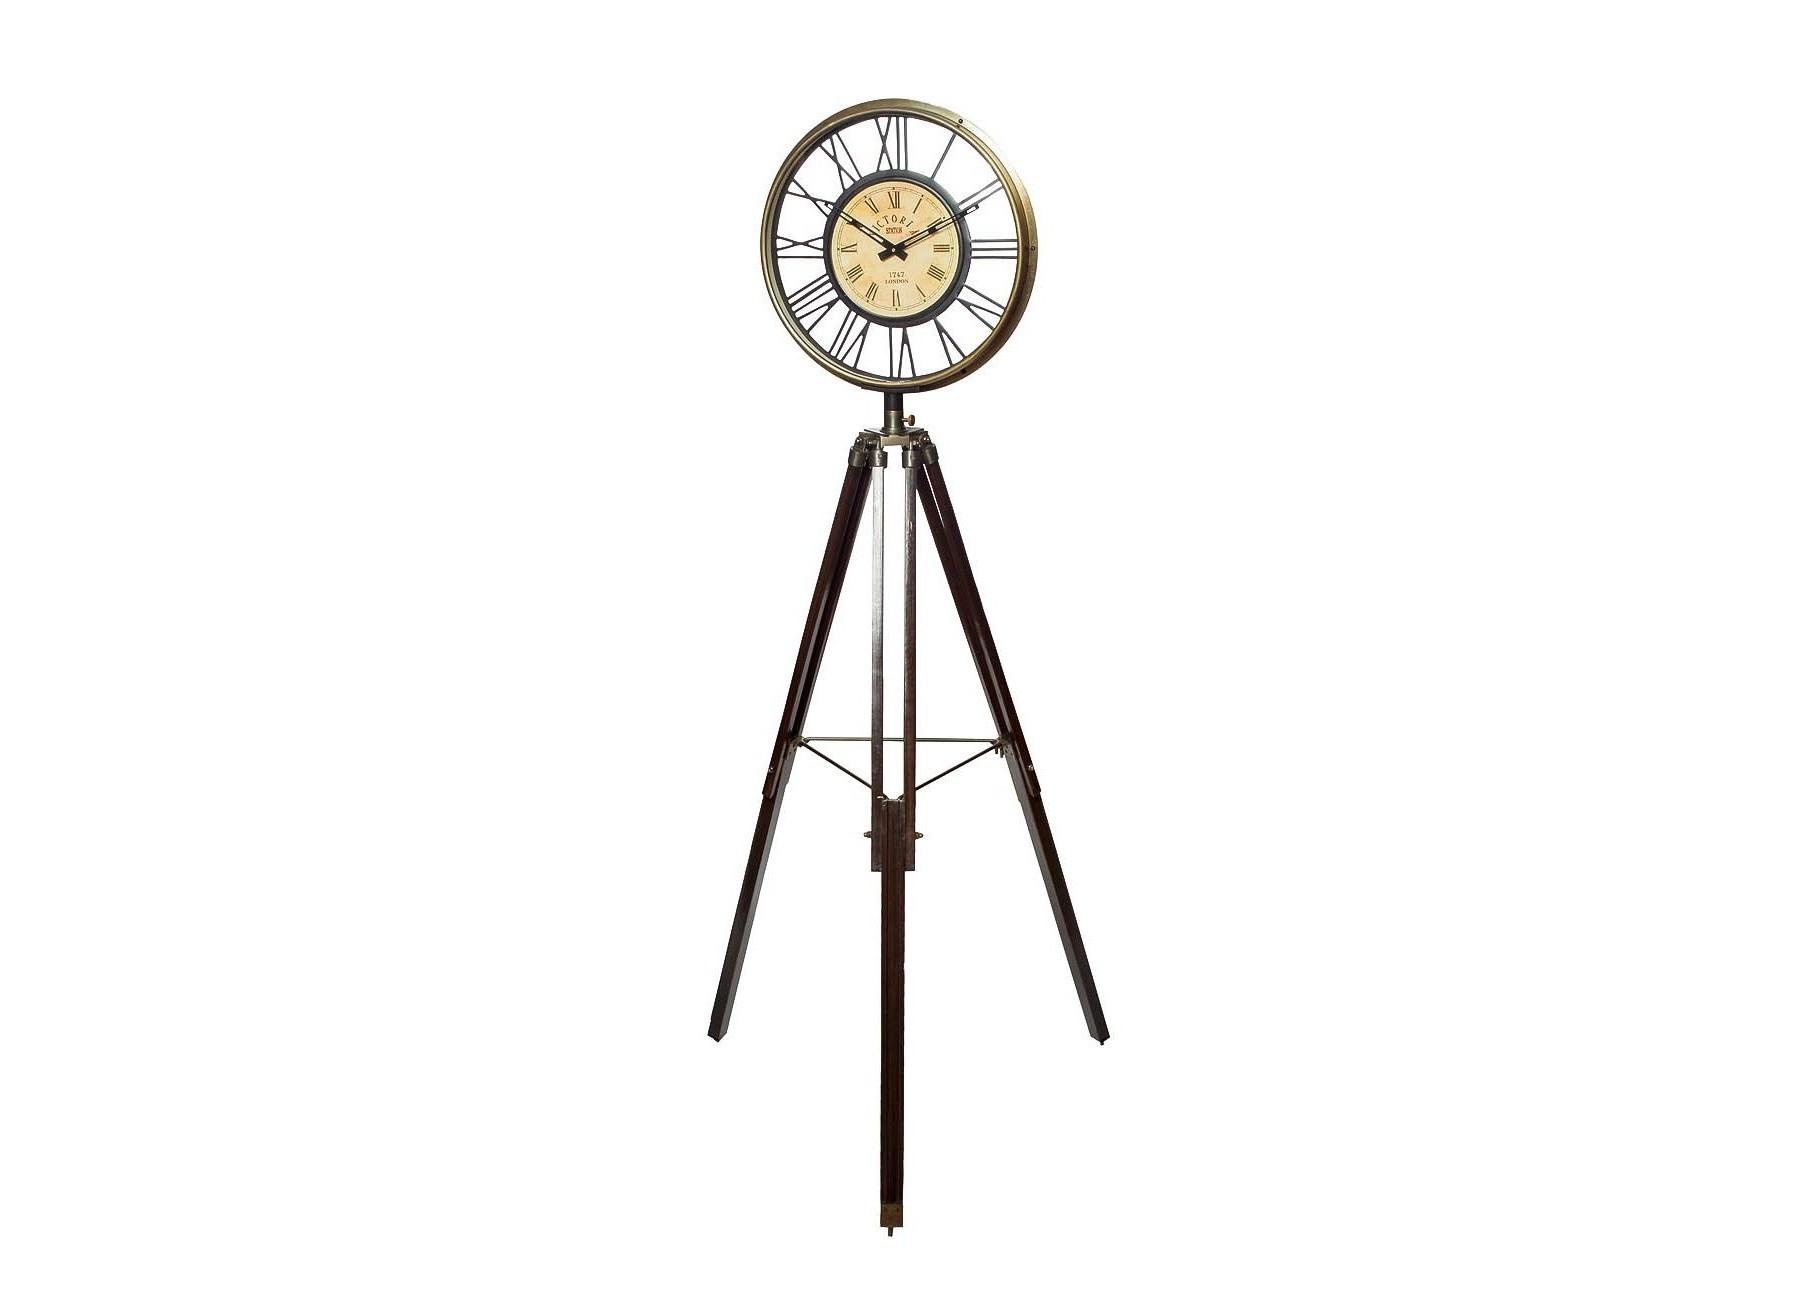 Часы напольные на треногеНапольные часы<br>&amp;lt;span style=&amp;quot;font-size: 14px;&amp;quot;&amp;gt;кварцевый механизм&amp;lt;/span&amp;gt;&amp;lt;div&amp;gt;&amp;lt;span style=&amp;quot;font-size: 14px;&amp;quot;&amp;gt;&amp;lt;br&amp;gt;&amp;lt;/span&amp;gt;&amp;lt;/div&amp;gt;<br><br>Material: Алюминий<br>Высота см: 159